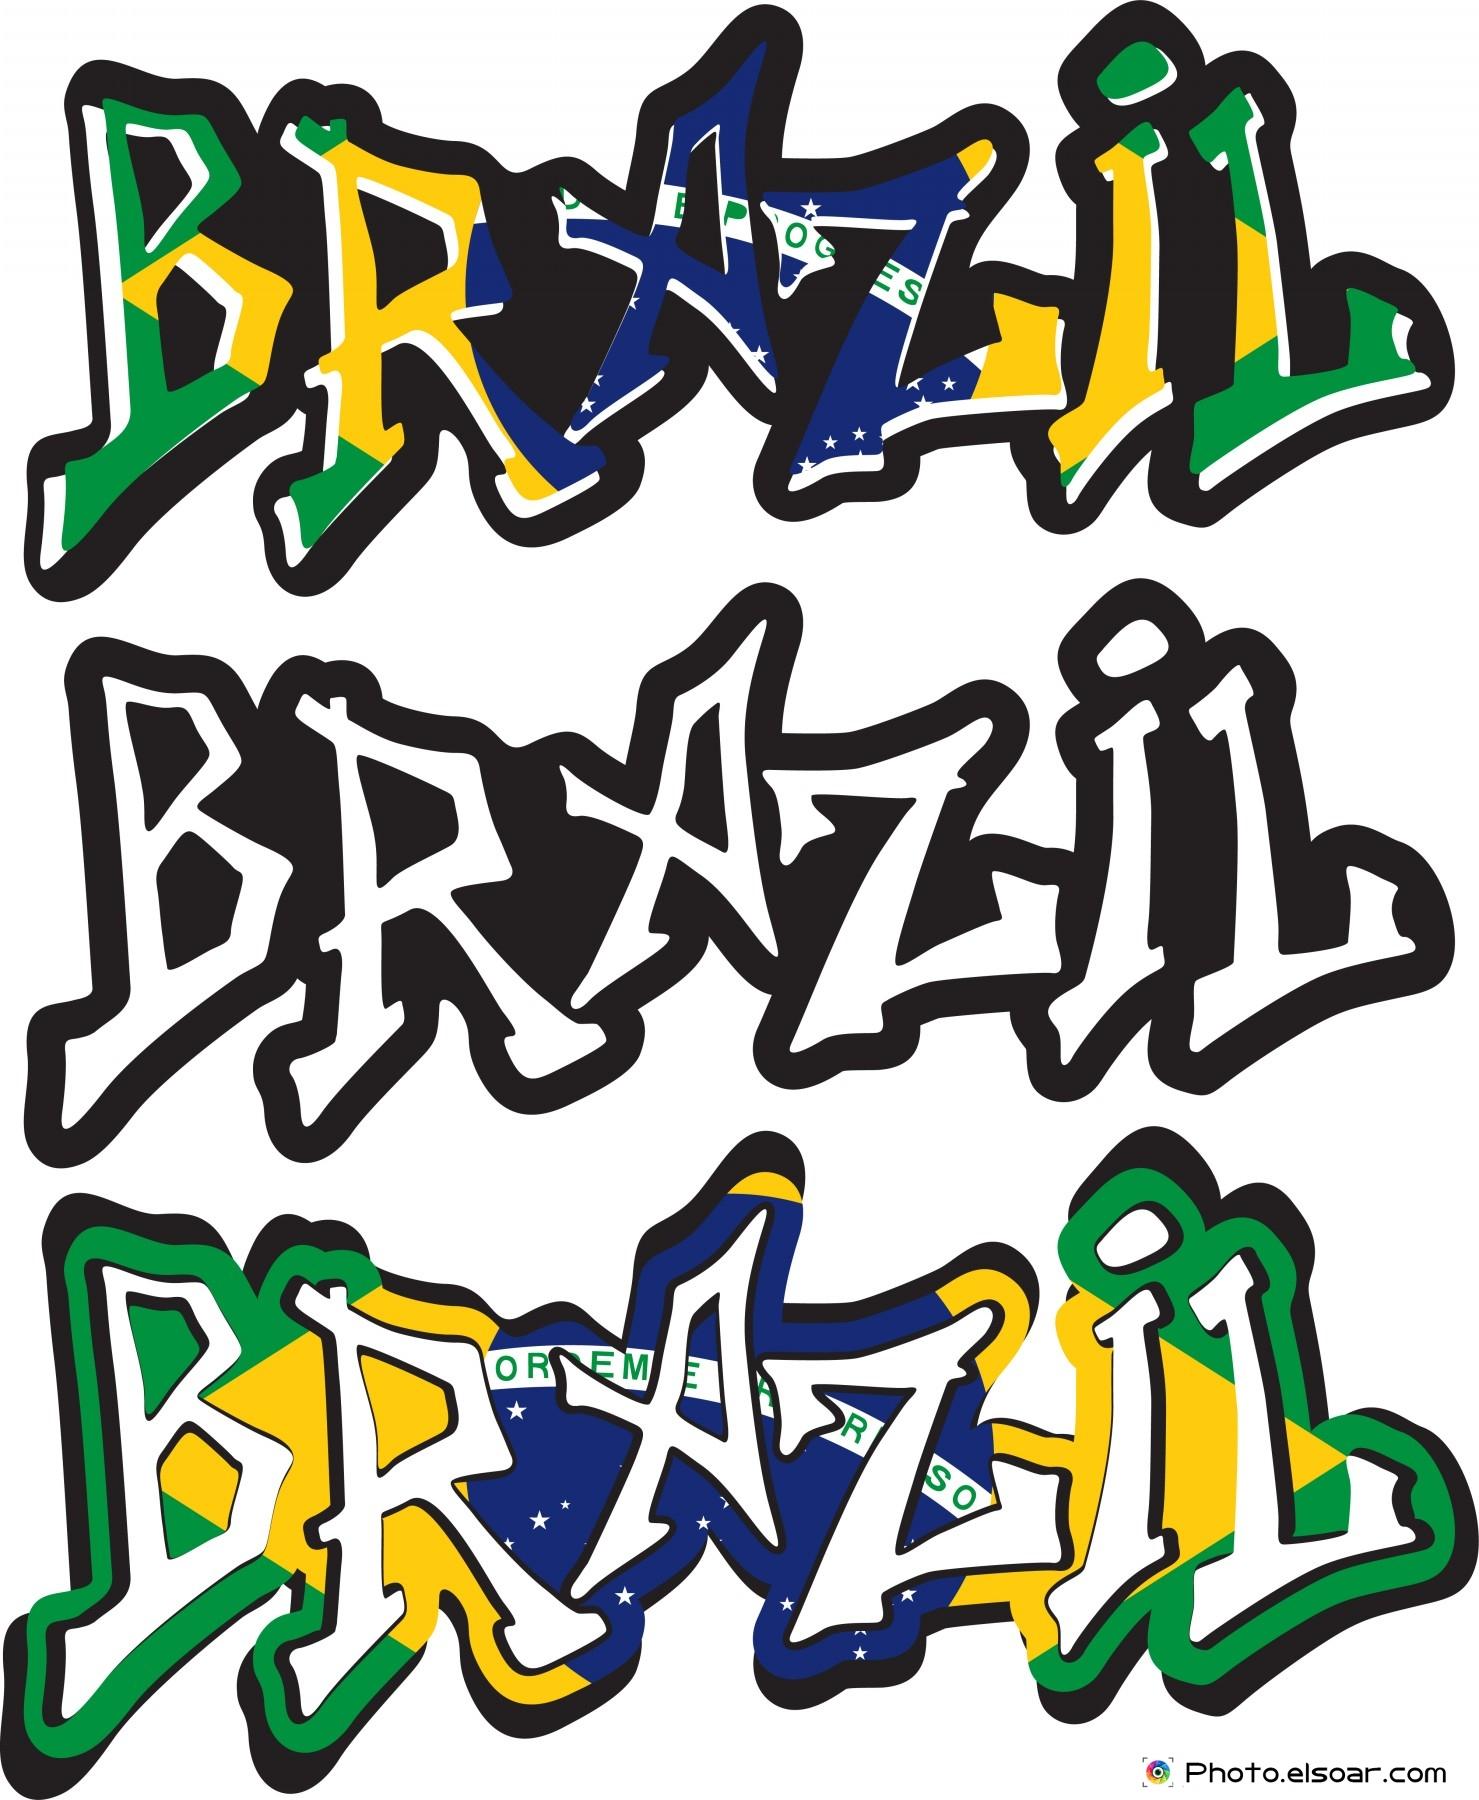 The Word Fashion In Graffiti